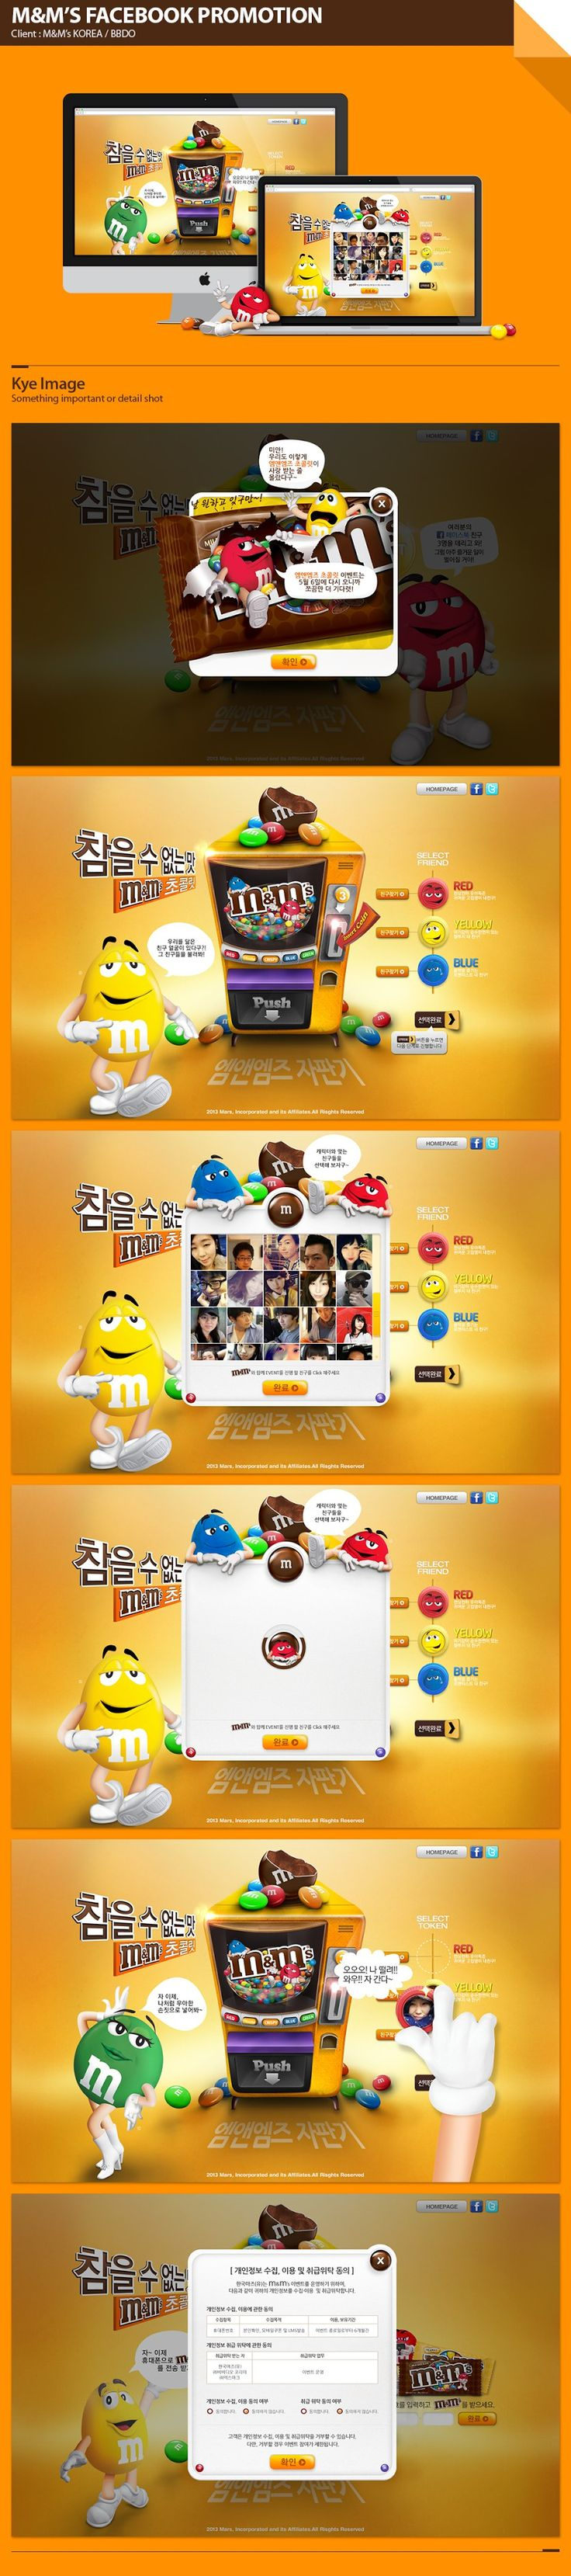 M&M's Facebook promotion